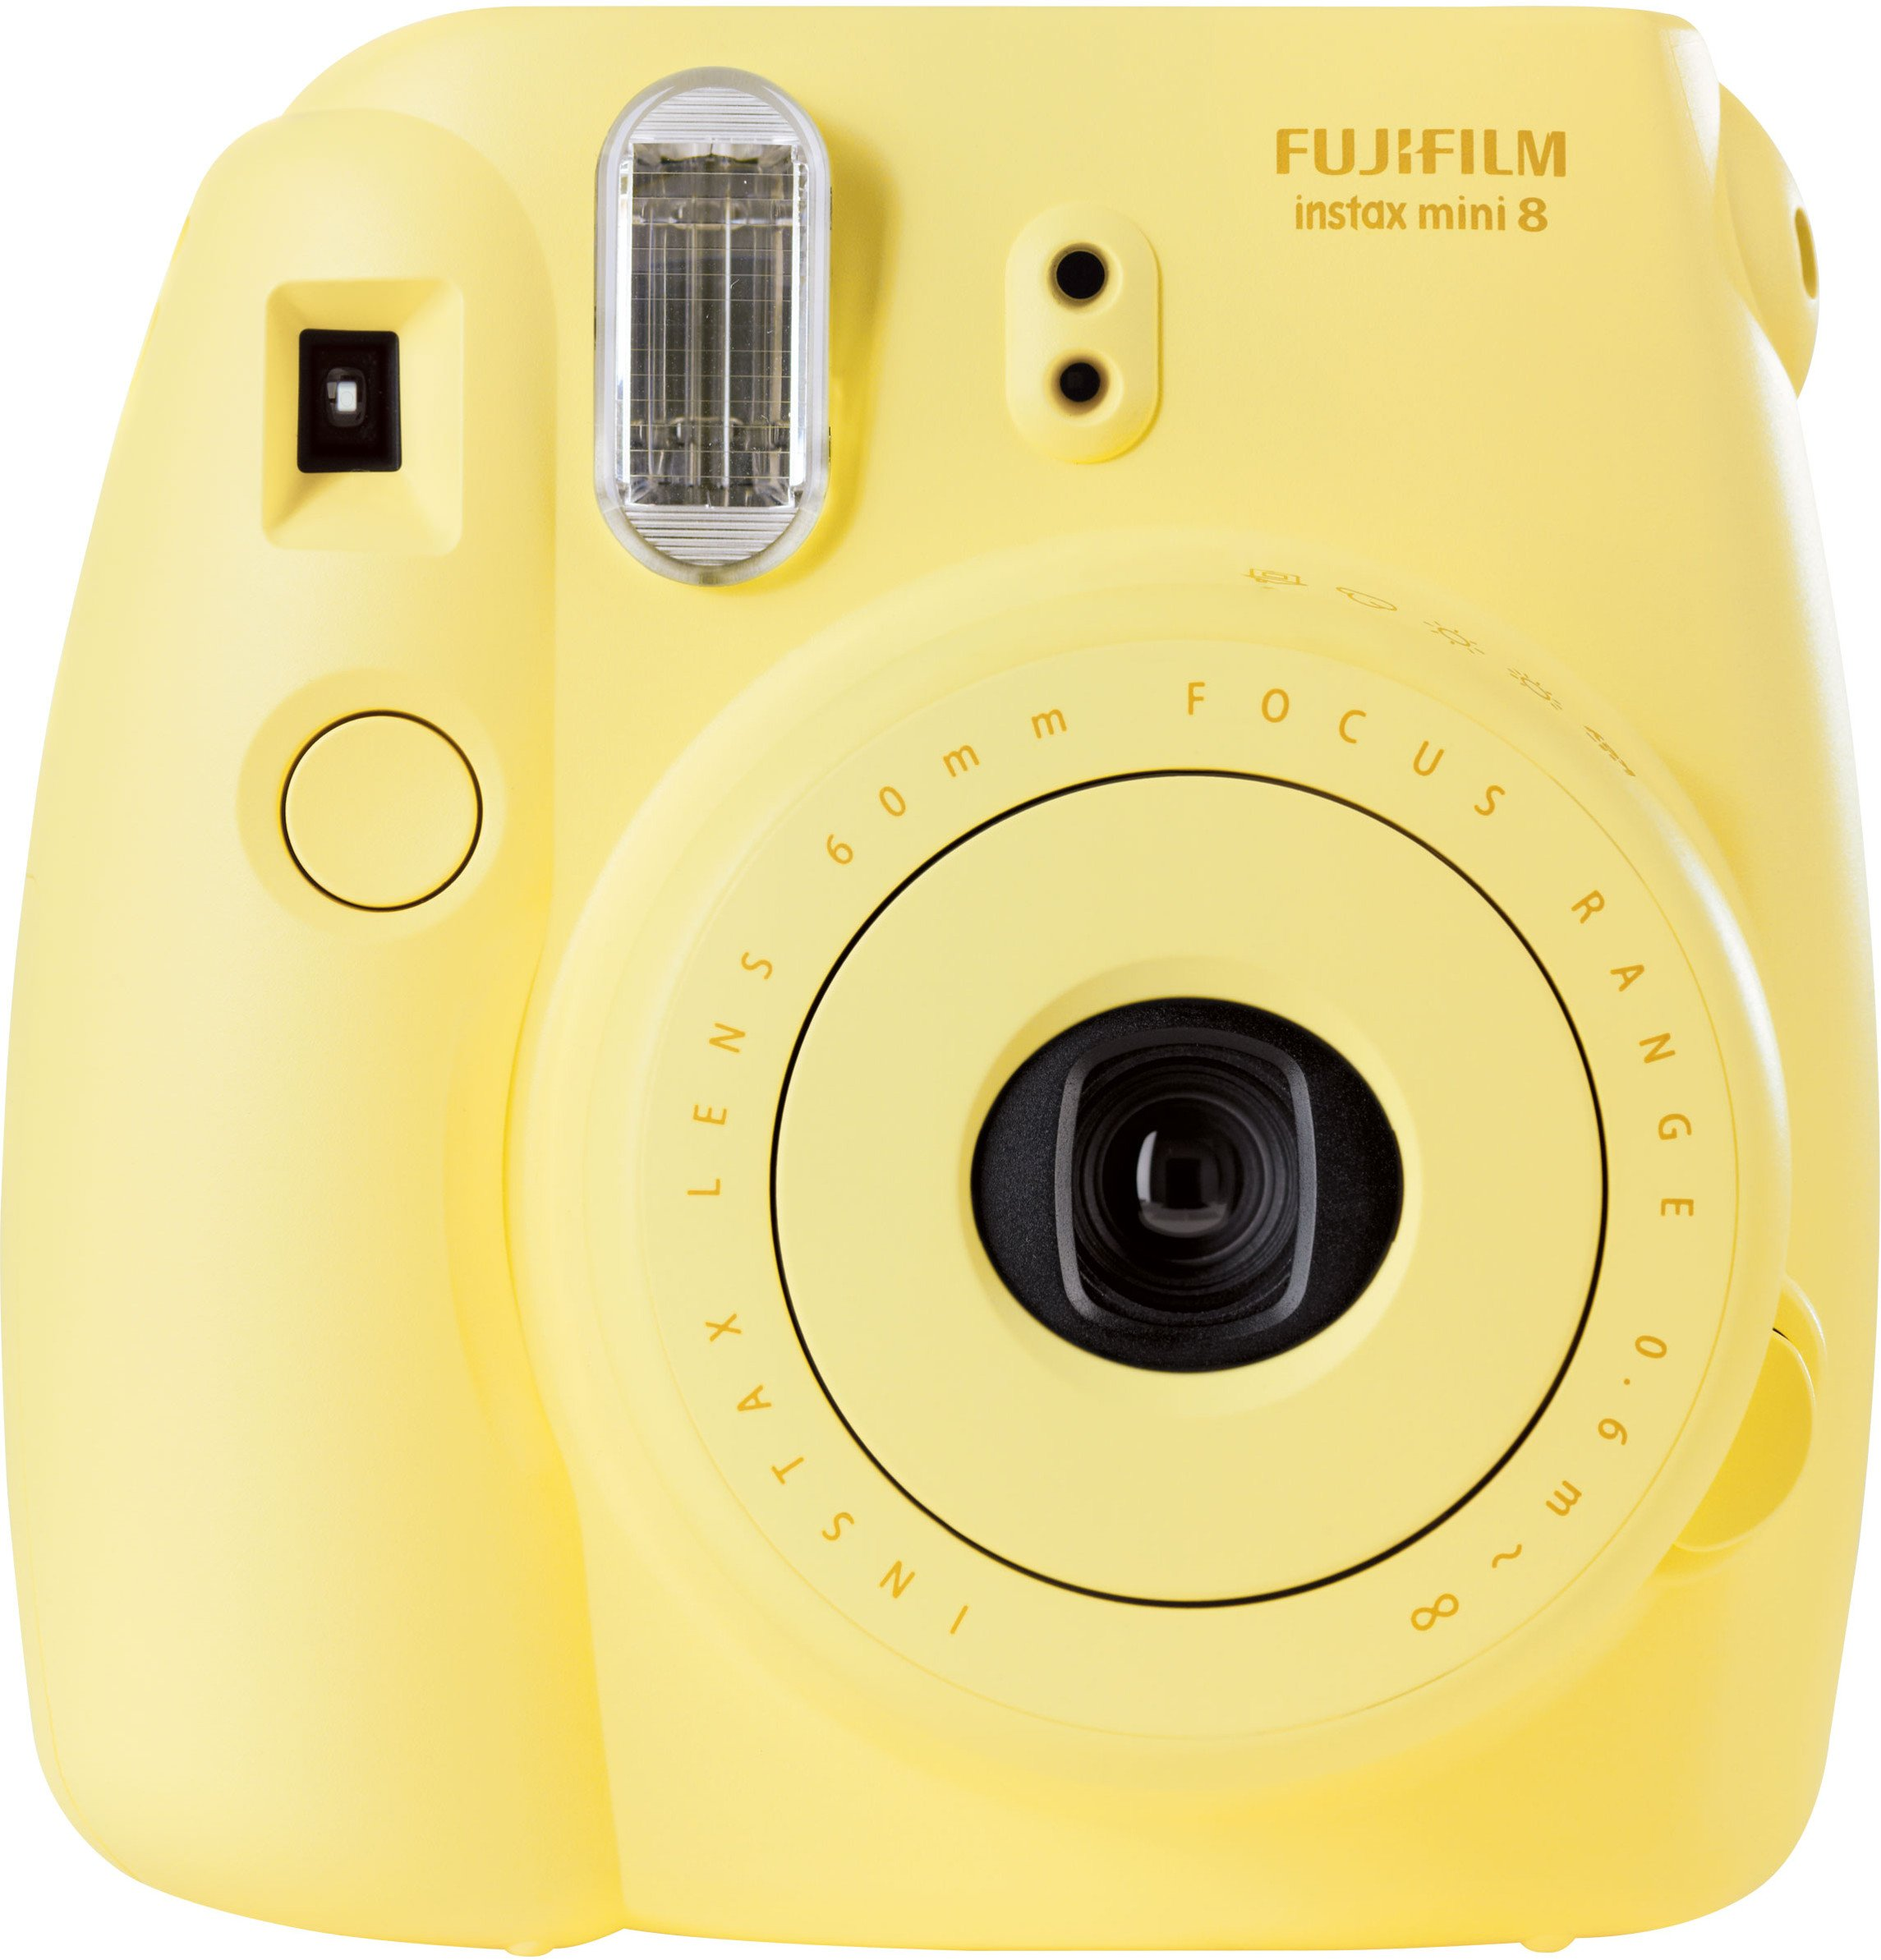 Fujifilm Instax P10GLB3080A Mini 8 Yellow + Strap and Battery